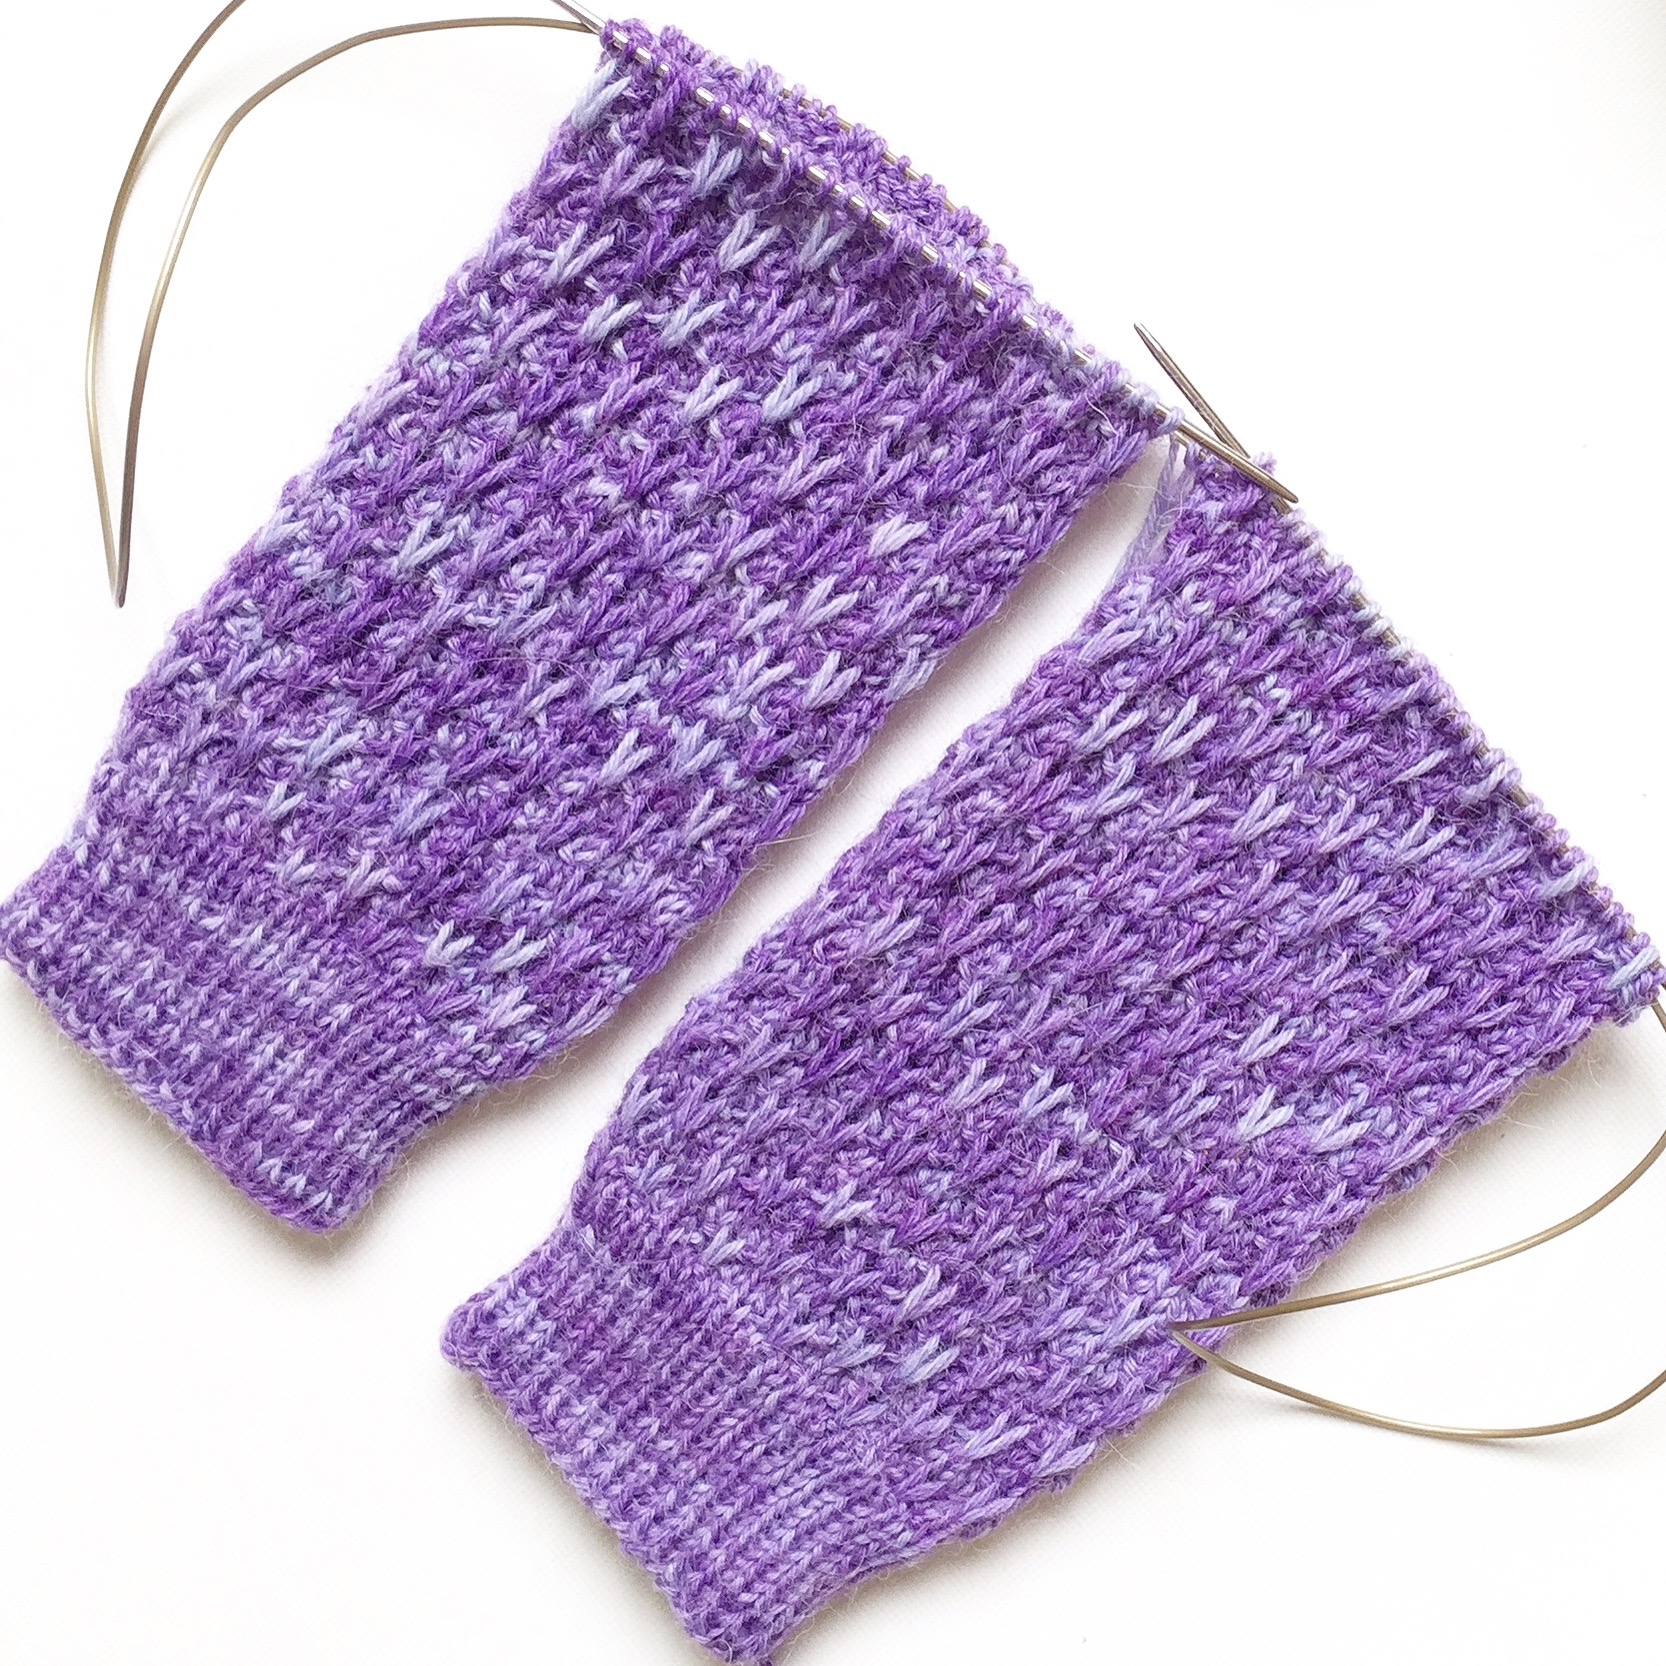 Lavender Blossom Socks Texture